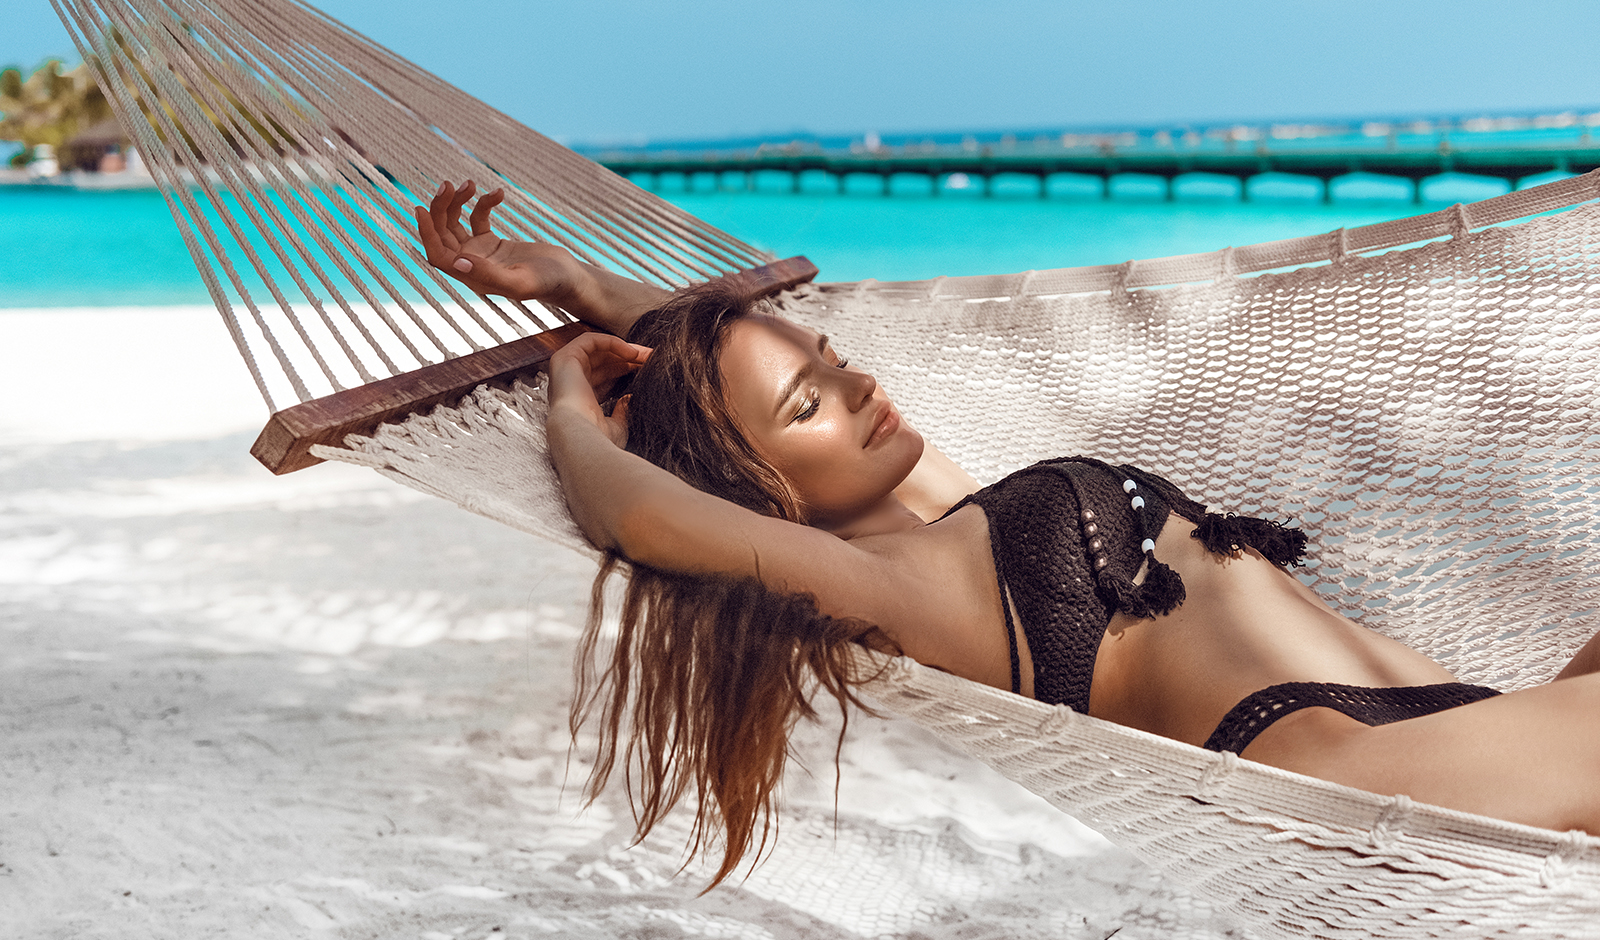 beauty-sleep-how-to-improve-the-quality-of-your-sleep-main-image-girl-relaxing-on-beach